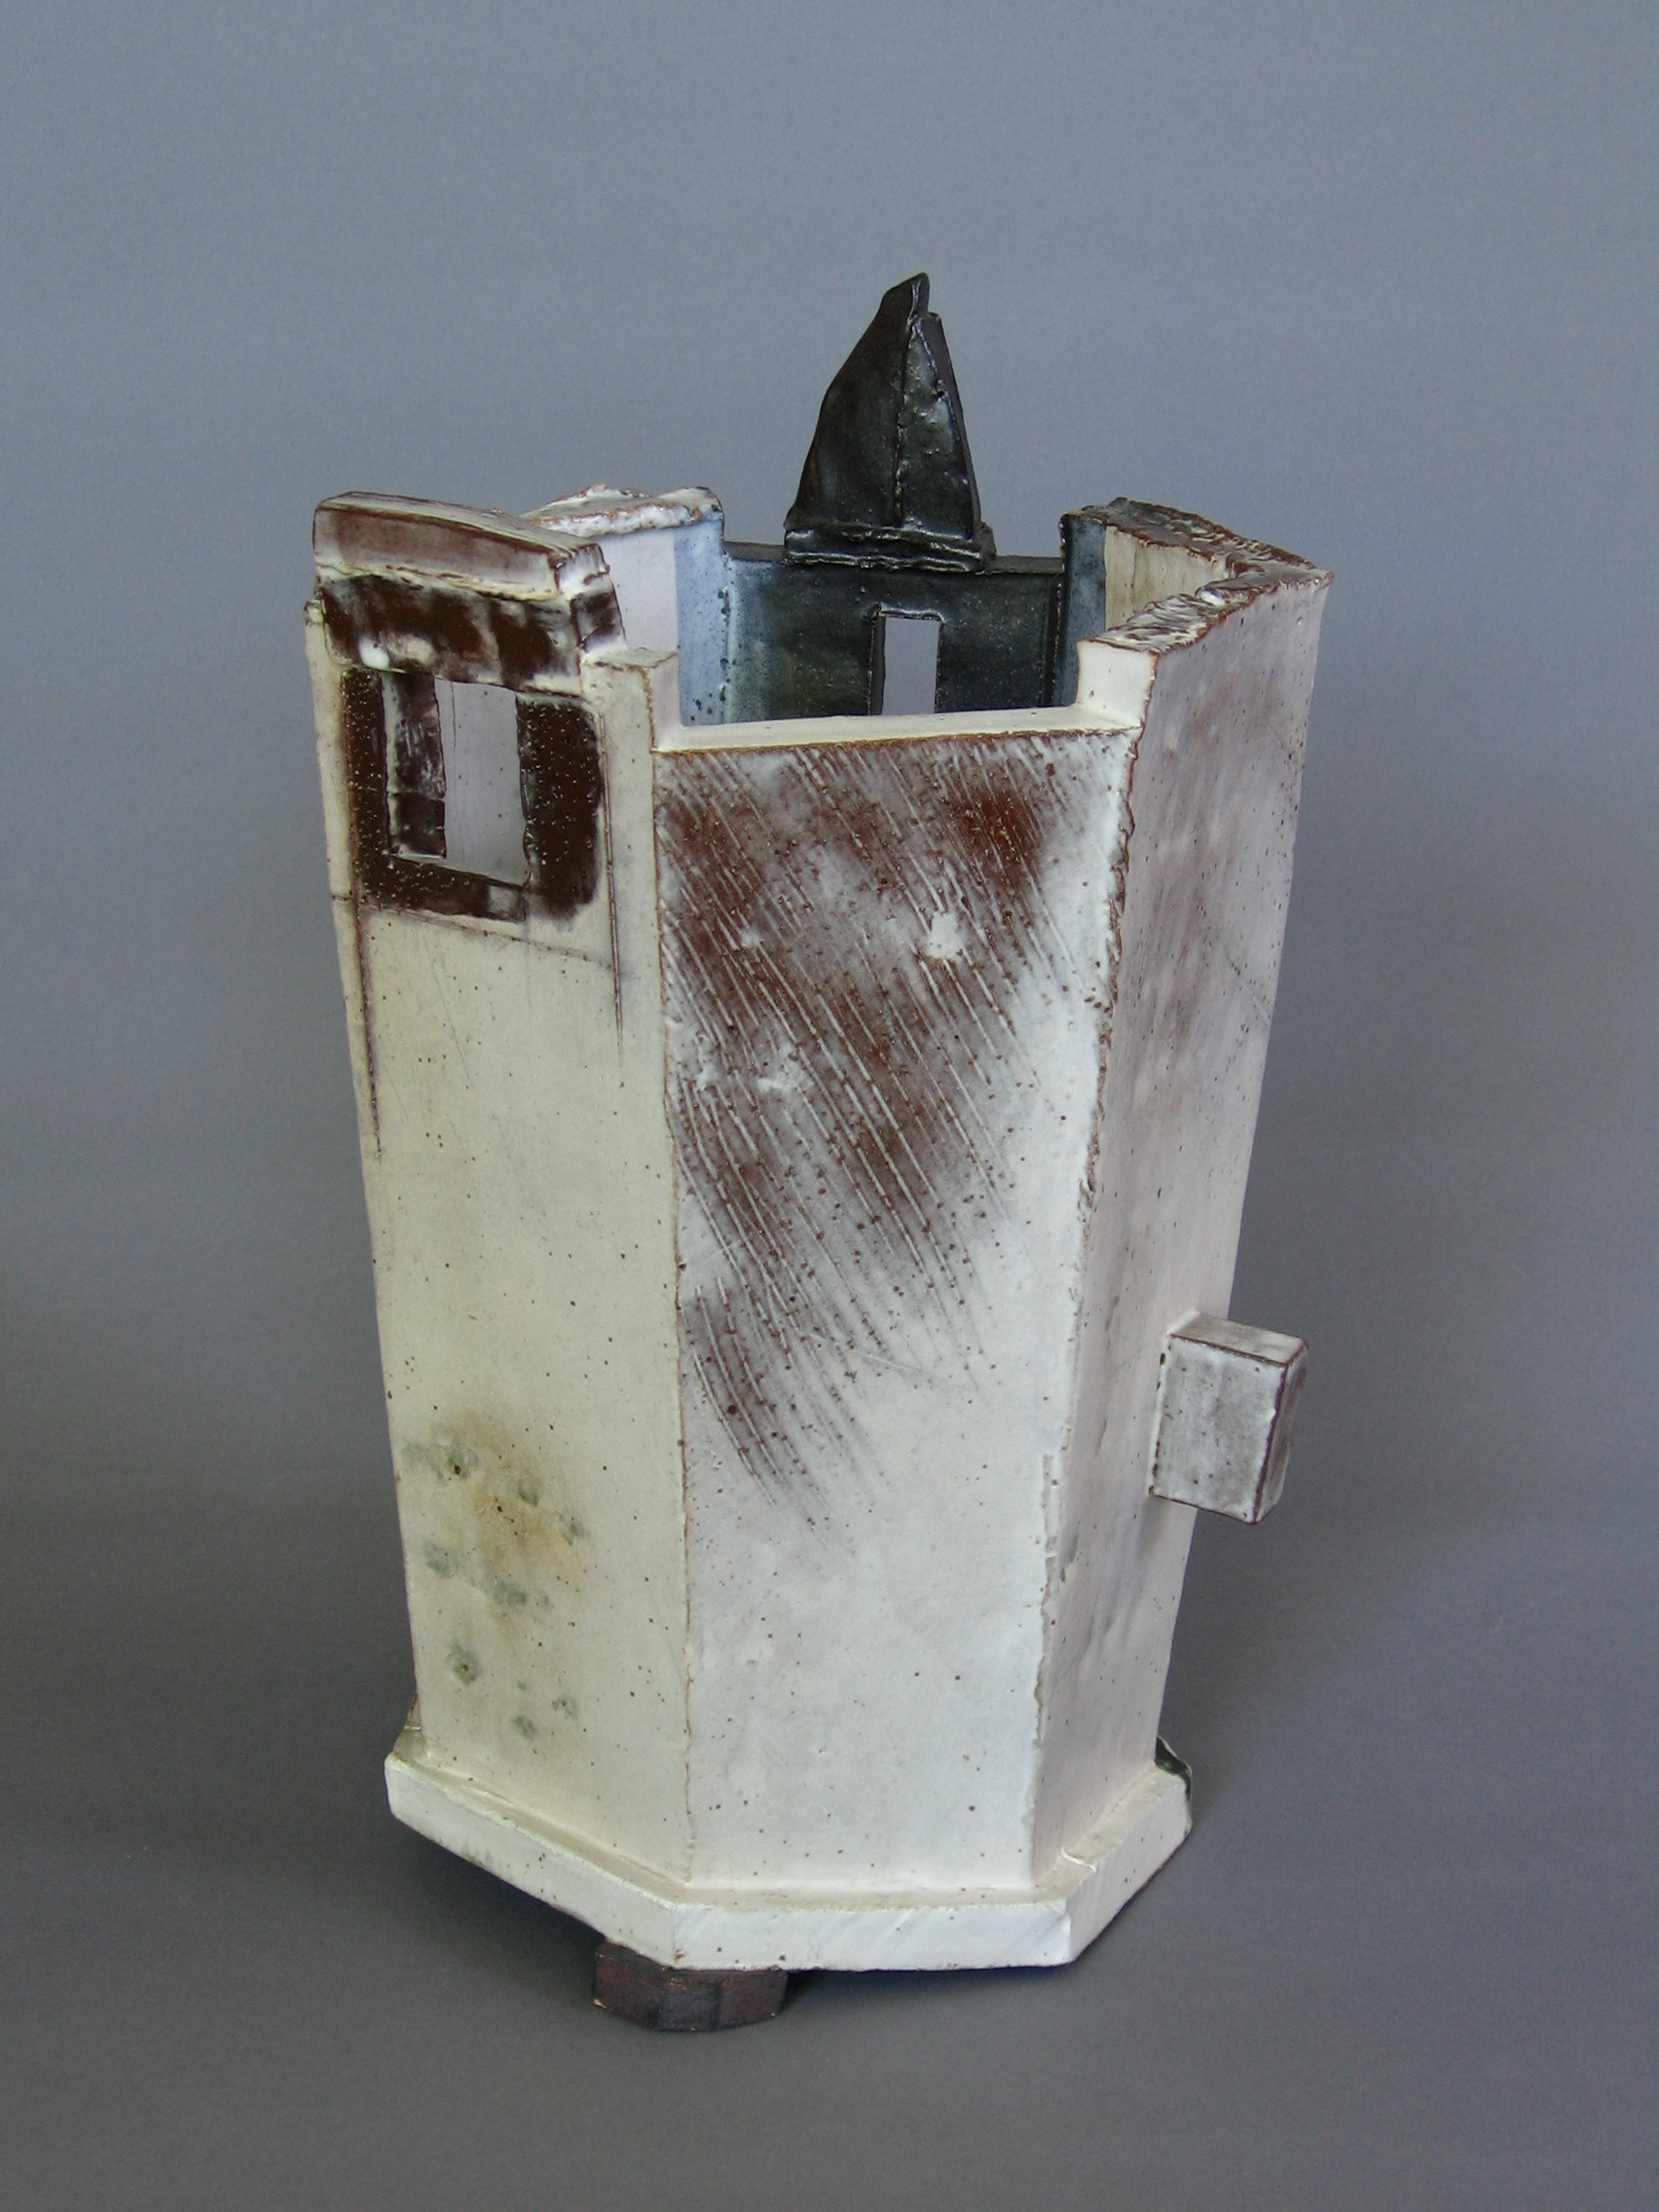 "Kübel 7 , 13"" x 8"" x 8"", Ceramic"